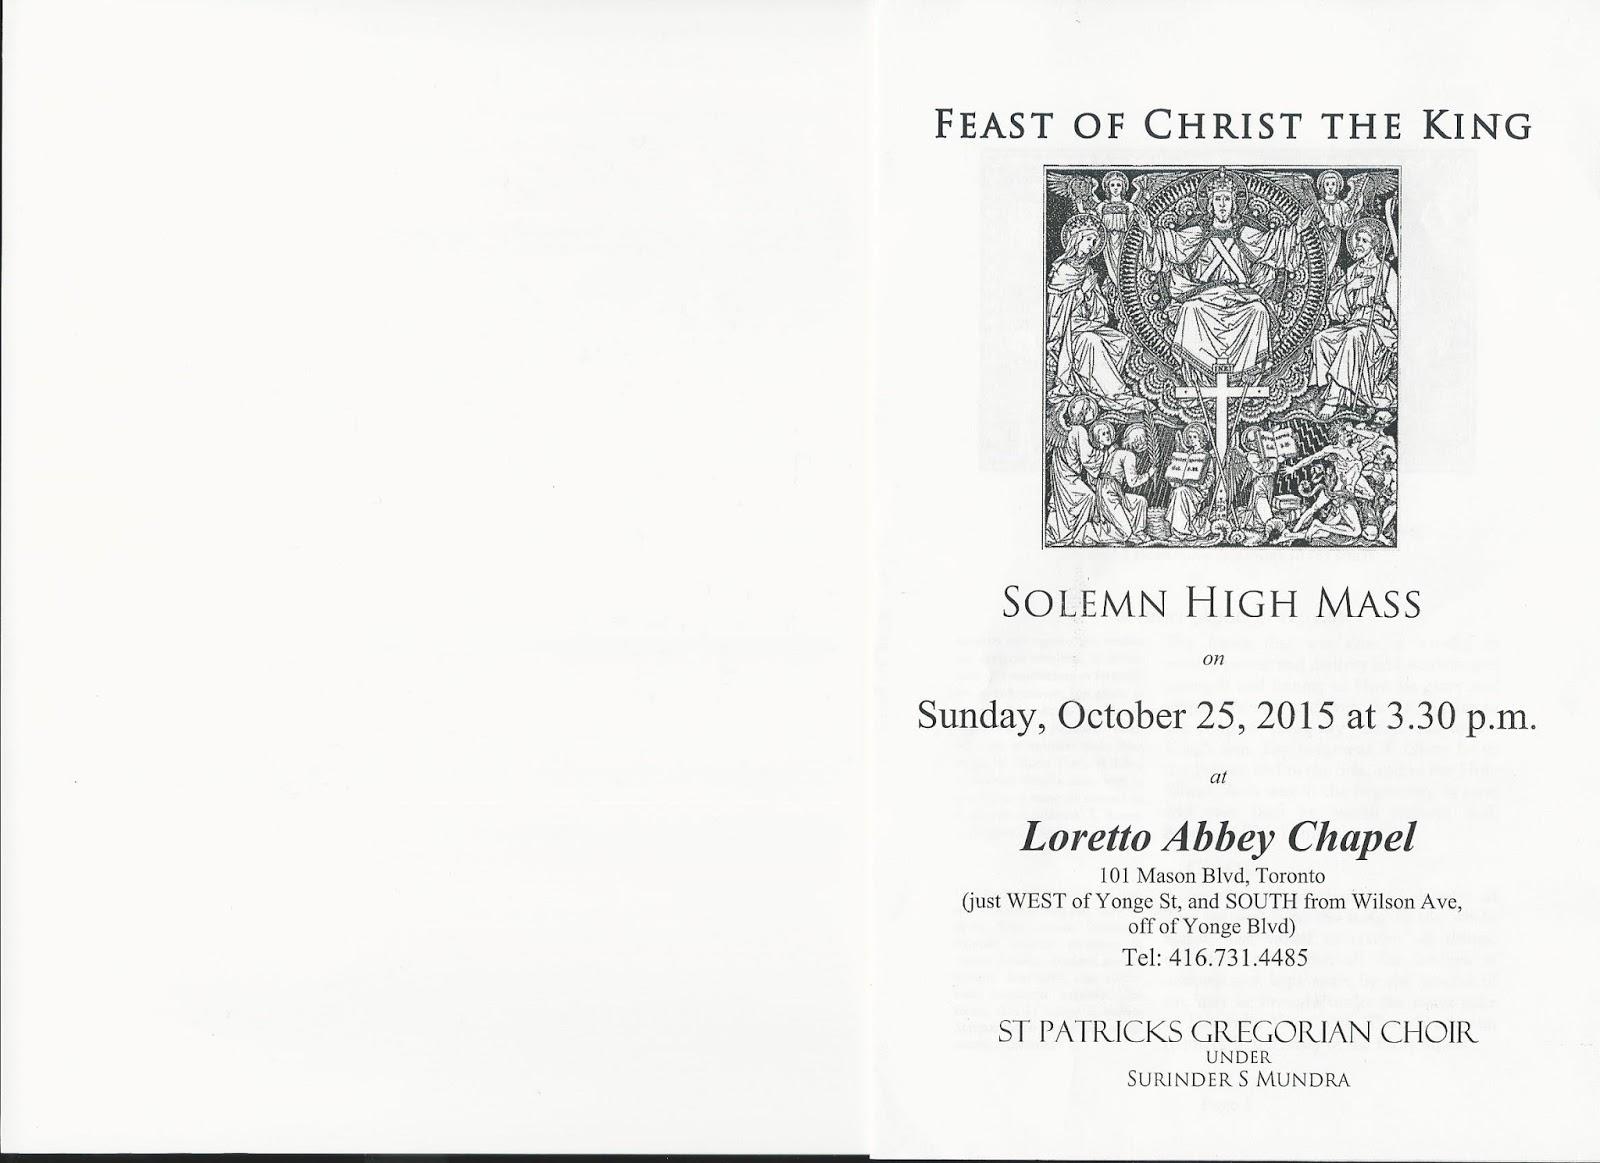 Servimus unum Deum - Latin Mass Altar Serving and Related Matters in